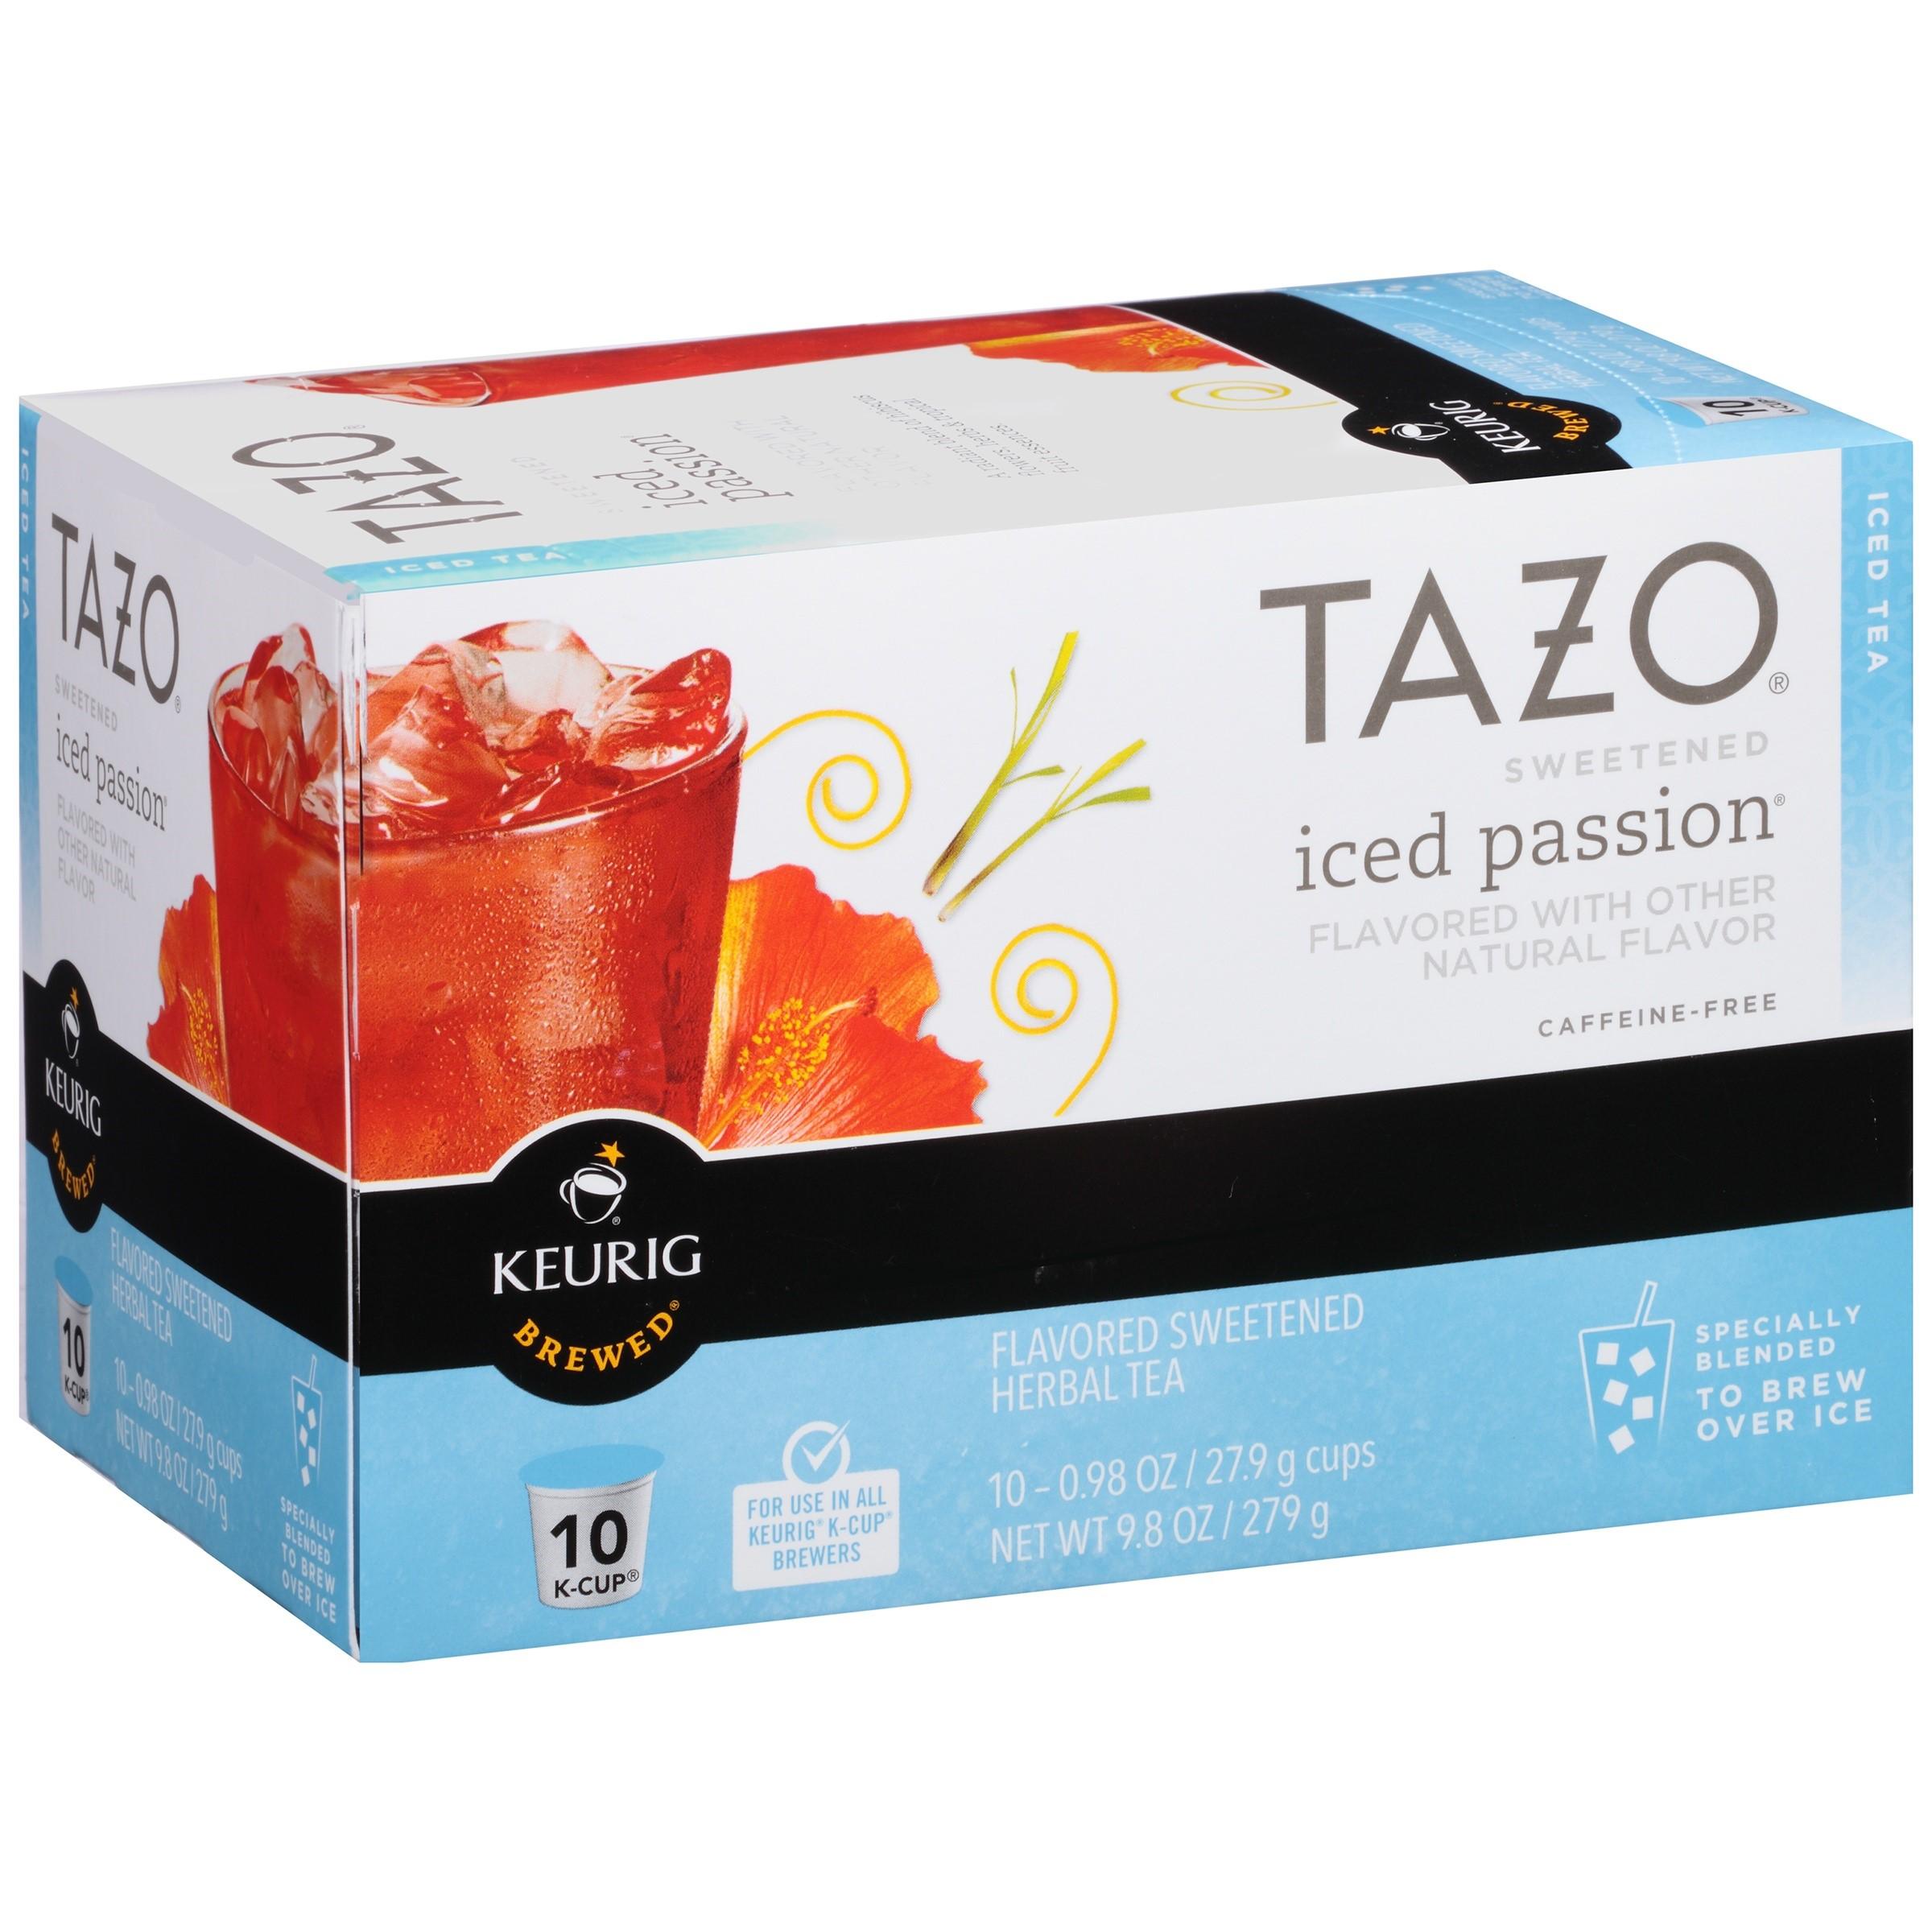 Tazo Sweetened Iced Passion Herbal Tea